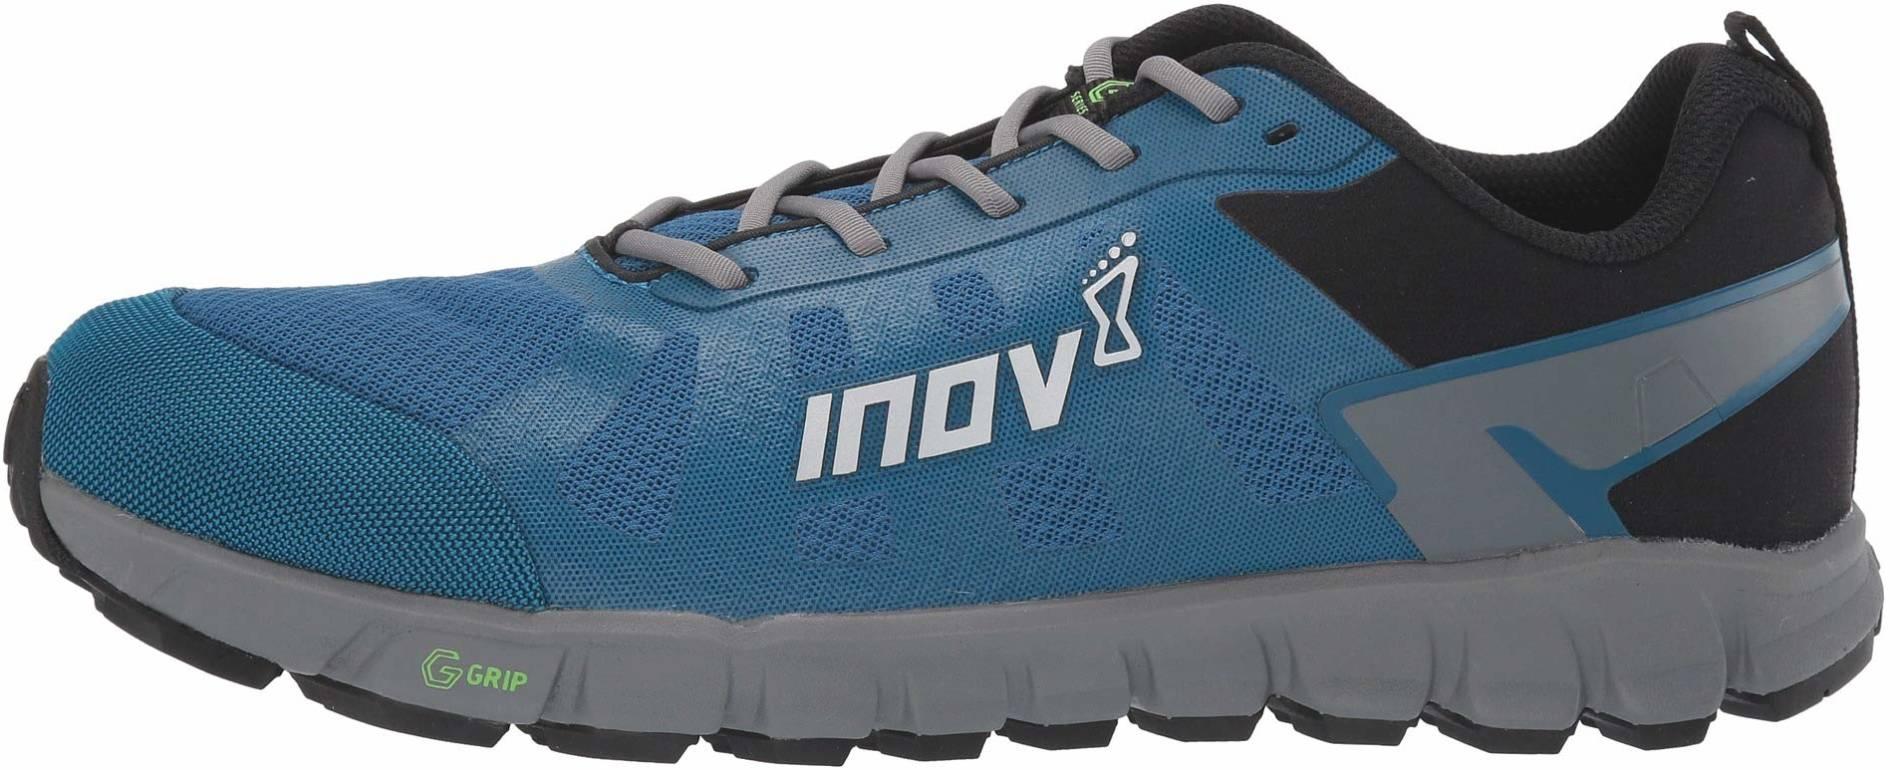 Blue Inov8 TerraUltra 260 Mens Trail Running Shoes